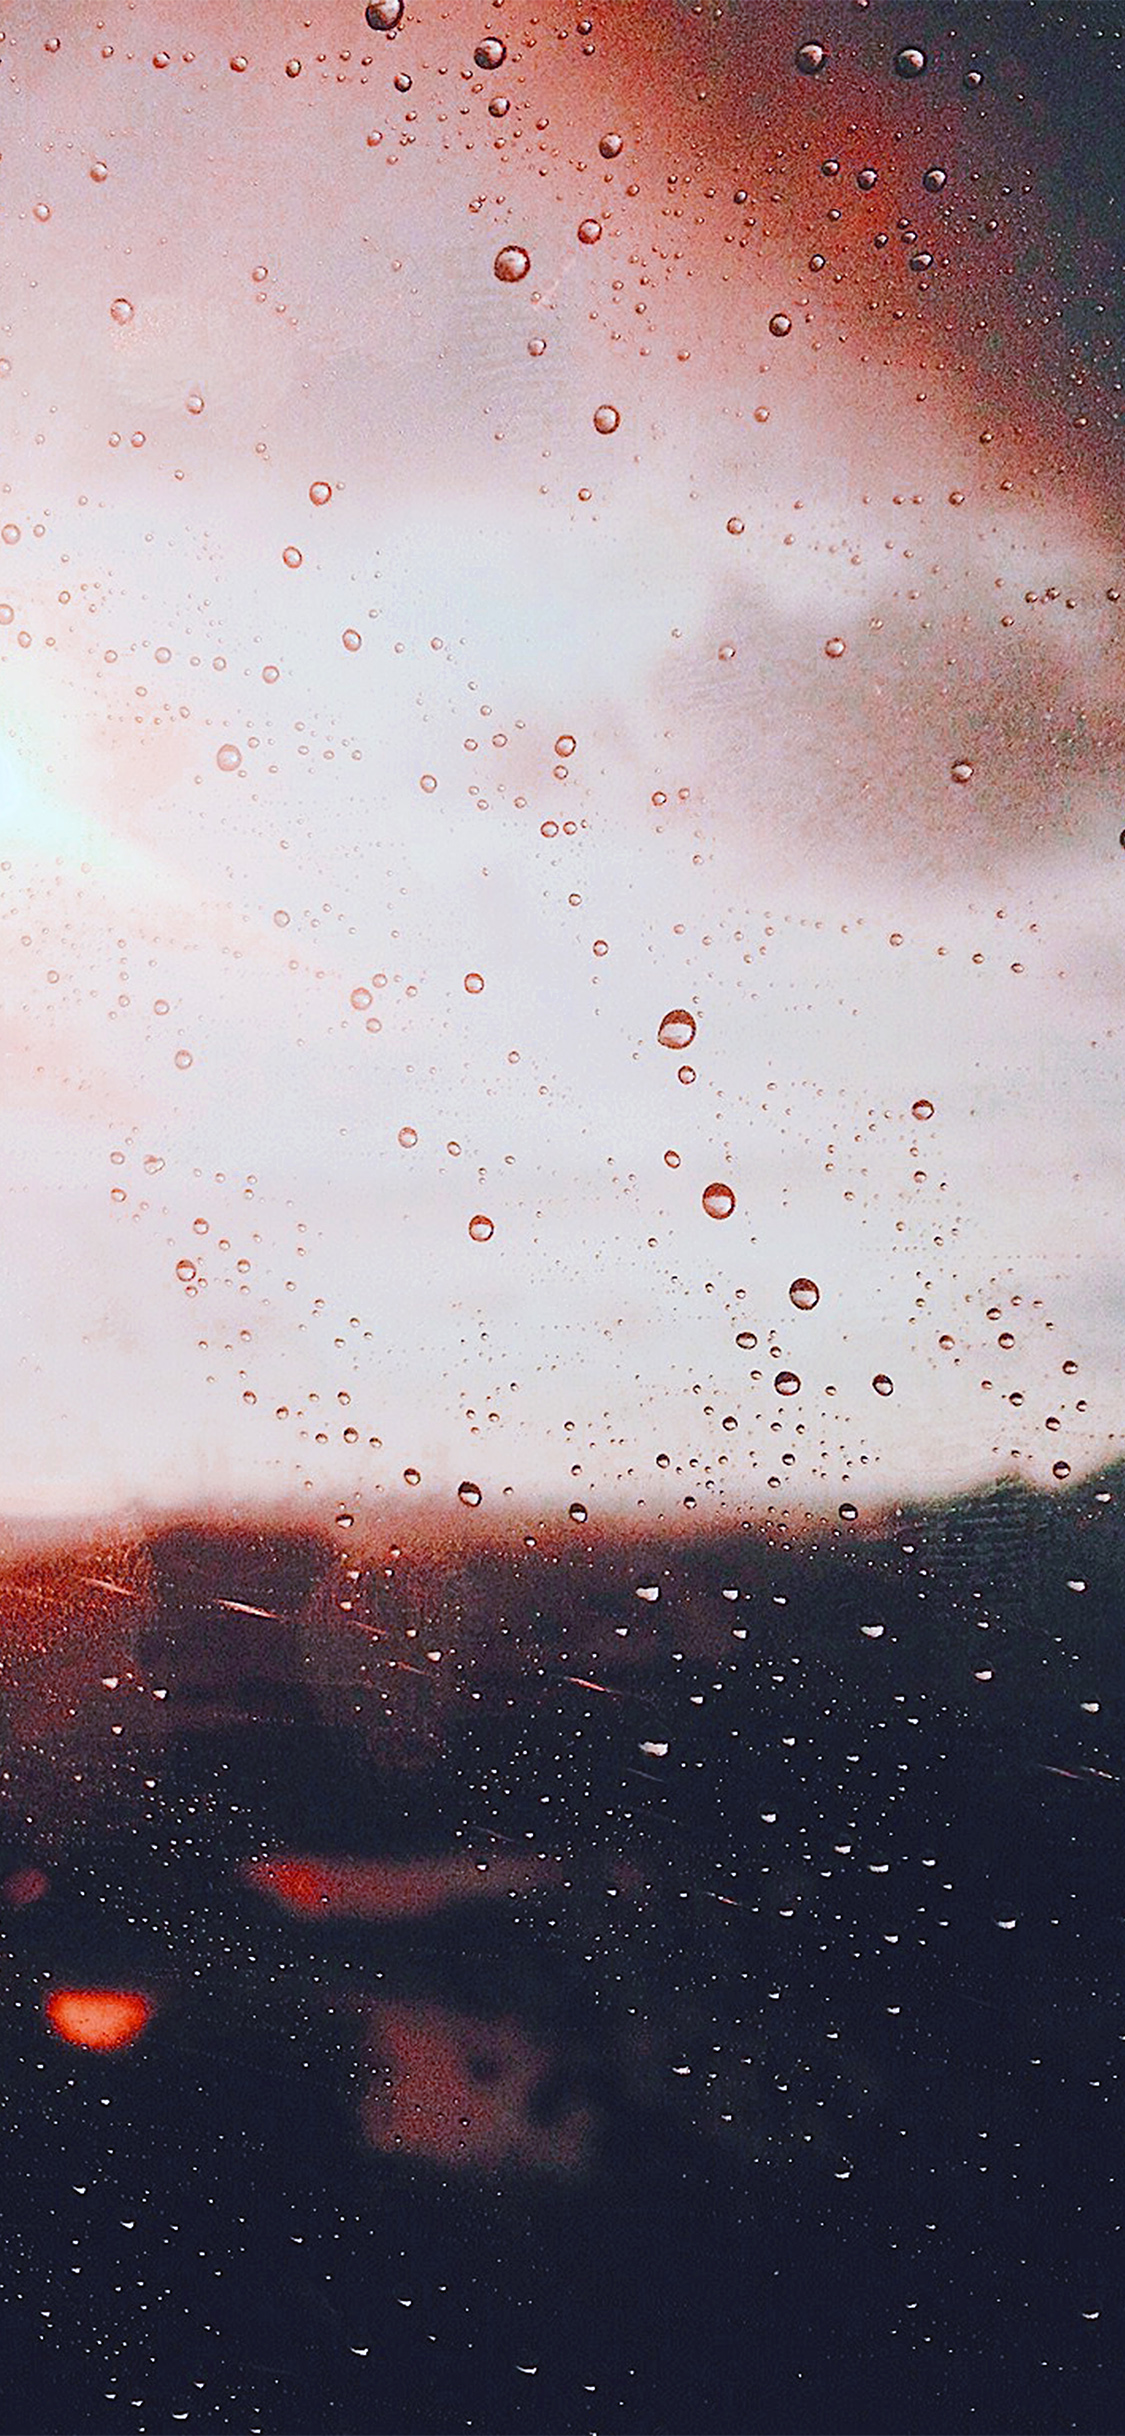 iPhonexpapers.com-Apple-iPhone-wallpaper-nj58-rain-window-day-sunlight-bokeh-blue-red